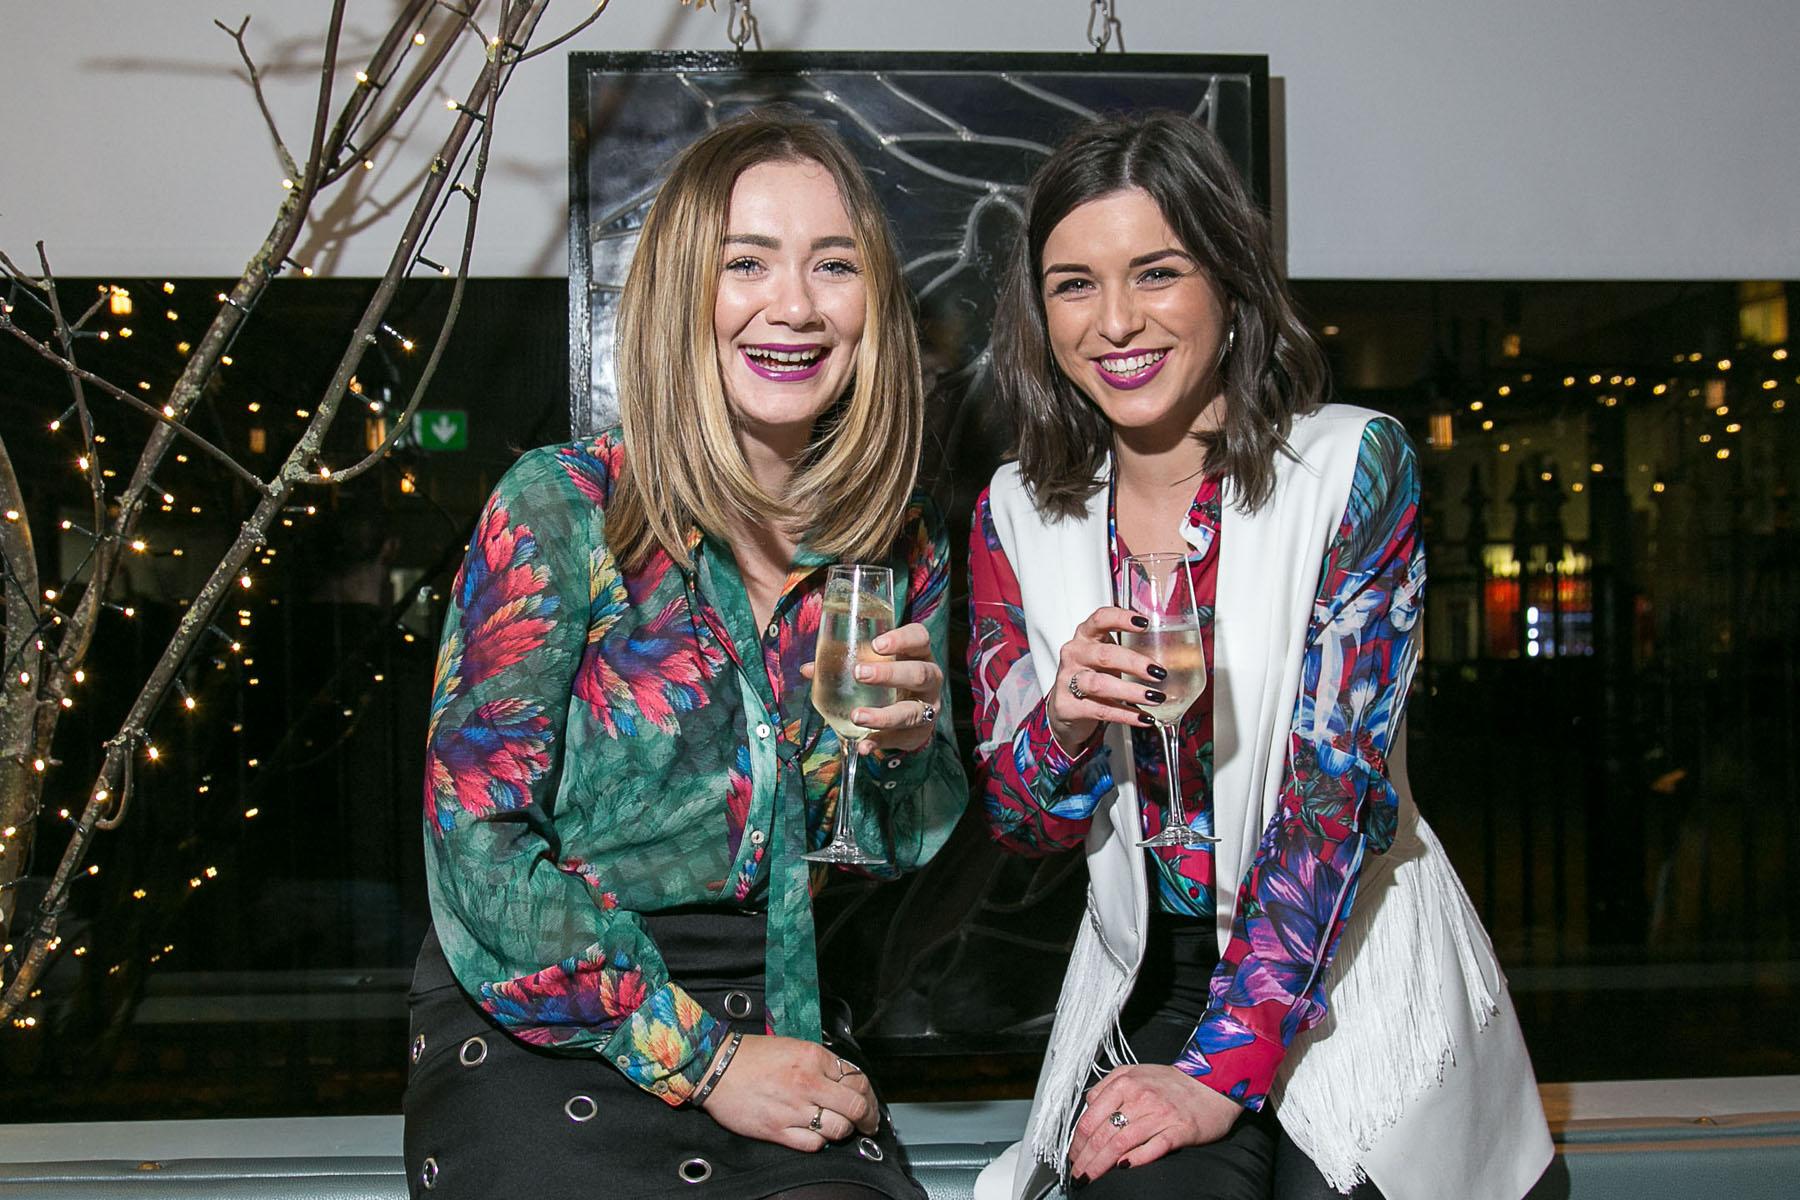 Laura McLaughlin & Ciara Gavin, both of Willow, Mainguard St